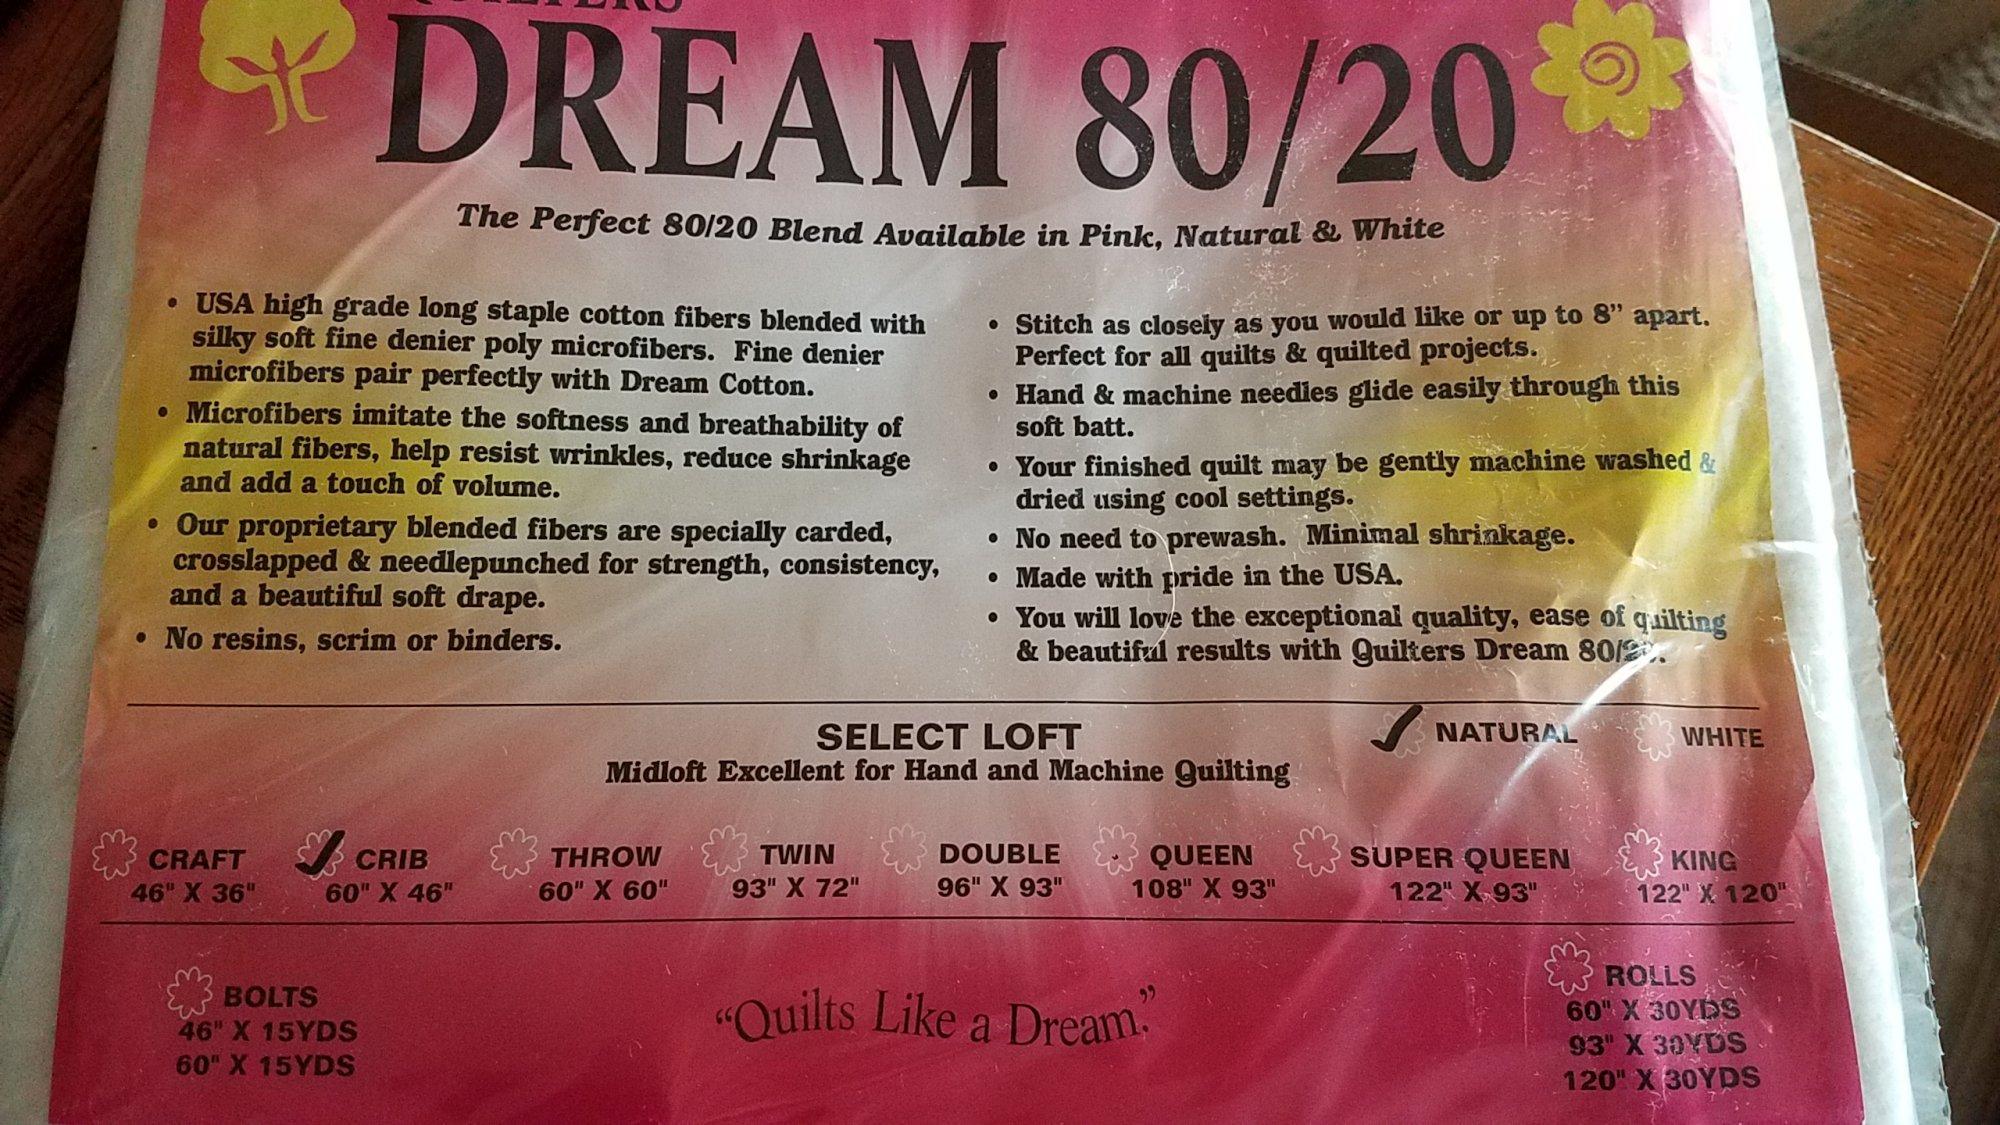 Dream 80/20 Crib